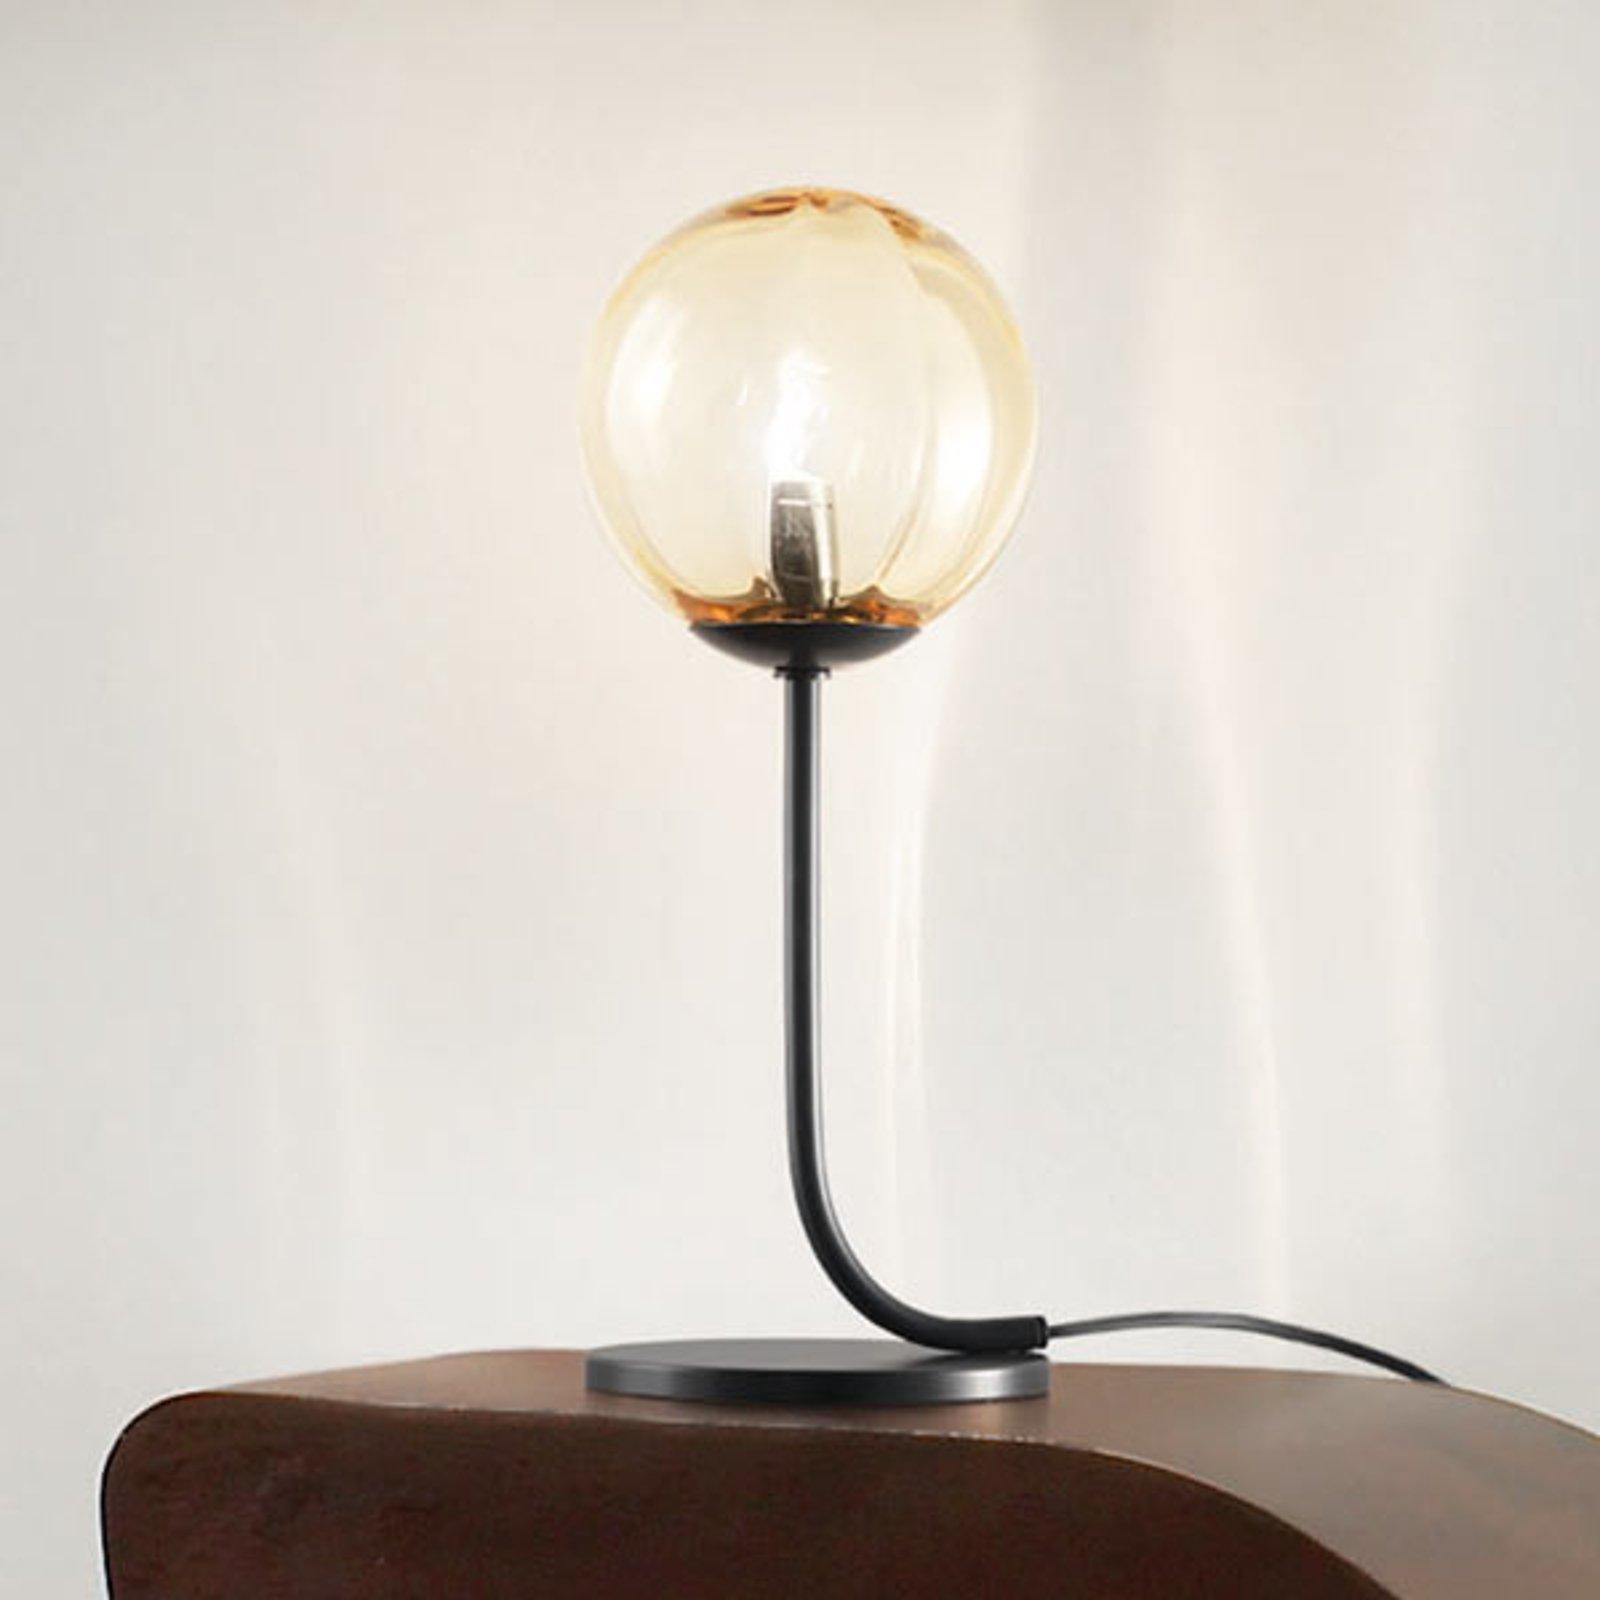 Designer-bordlampe Puppet av muranoglass